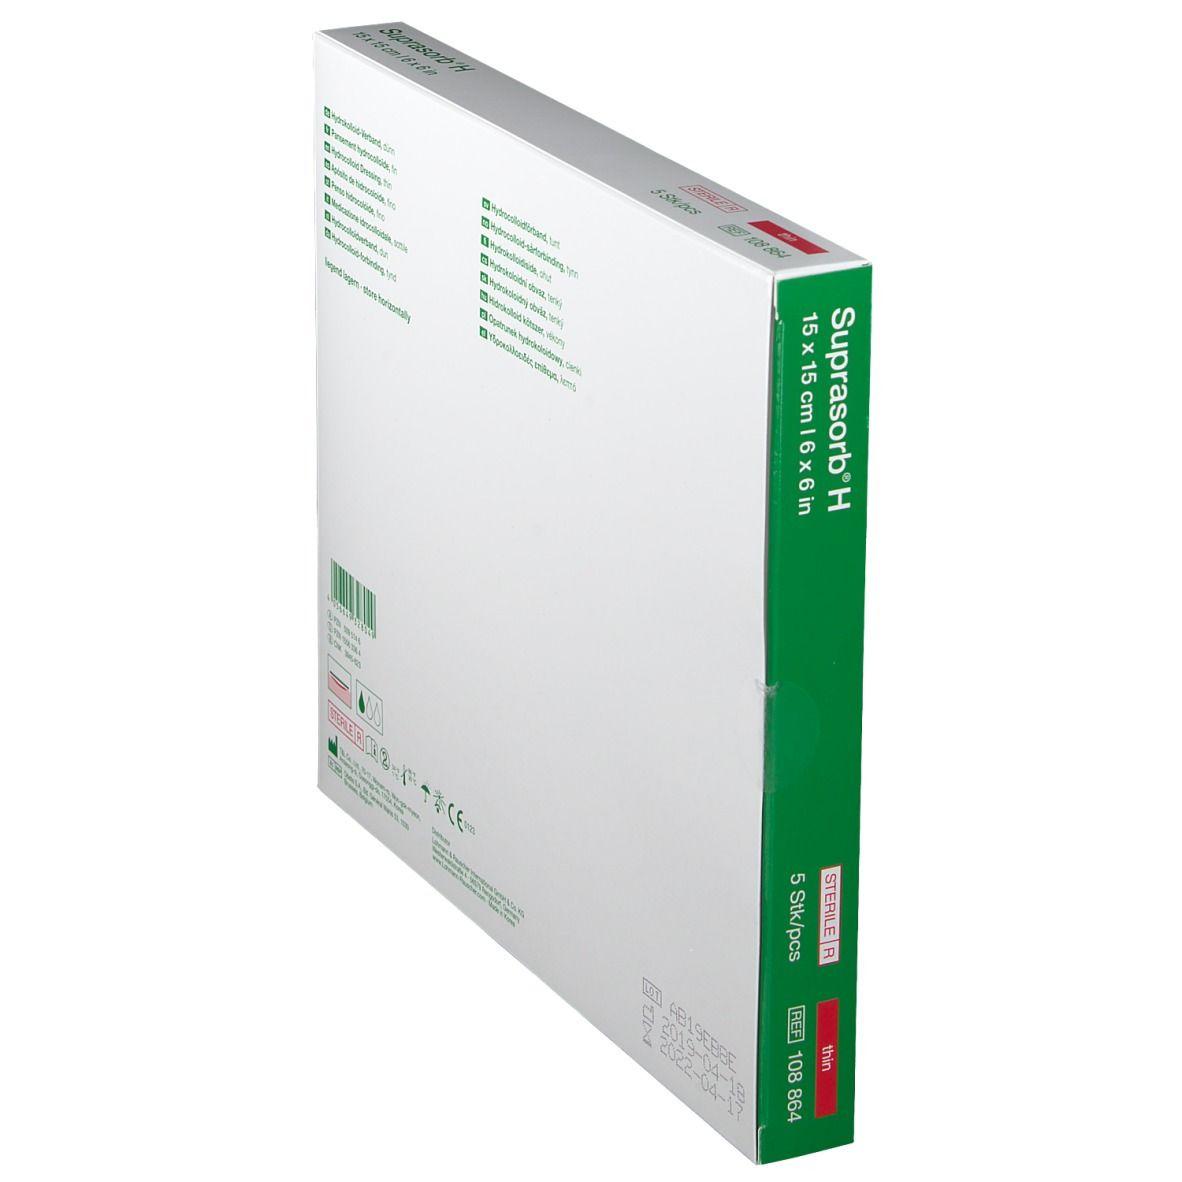 Suprasorb® H Hydrokolloid-Verband Sacrum 15 x 15 cm